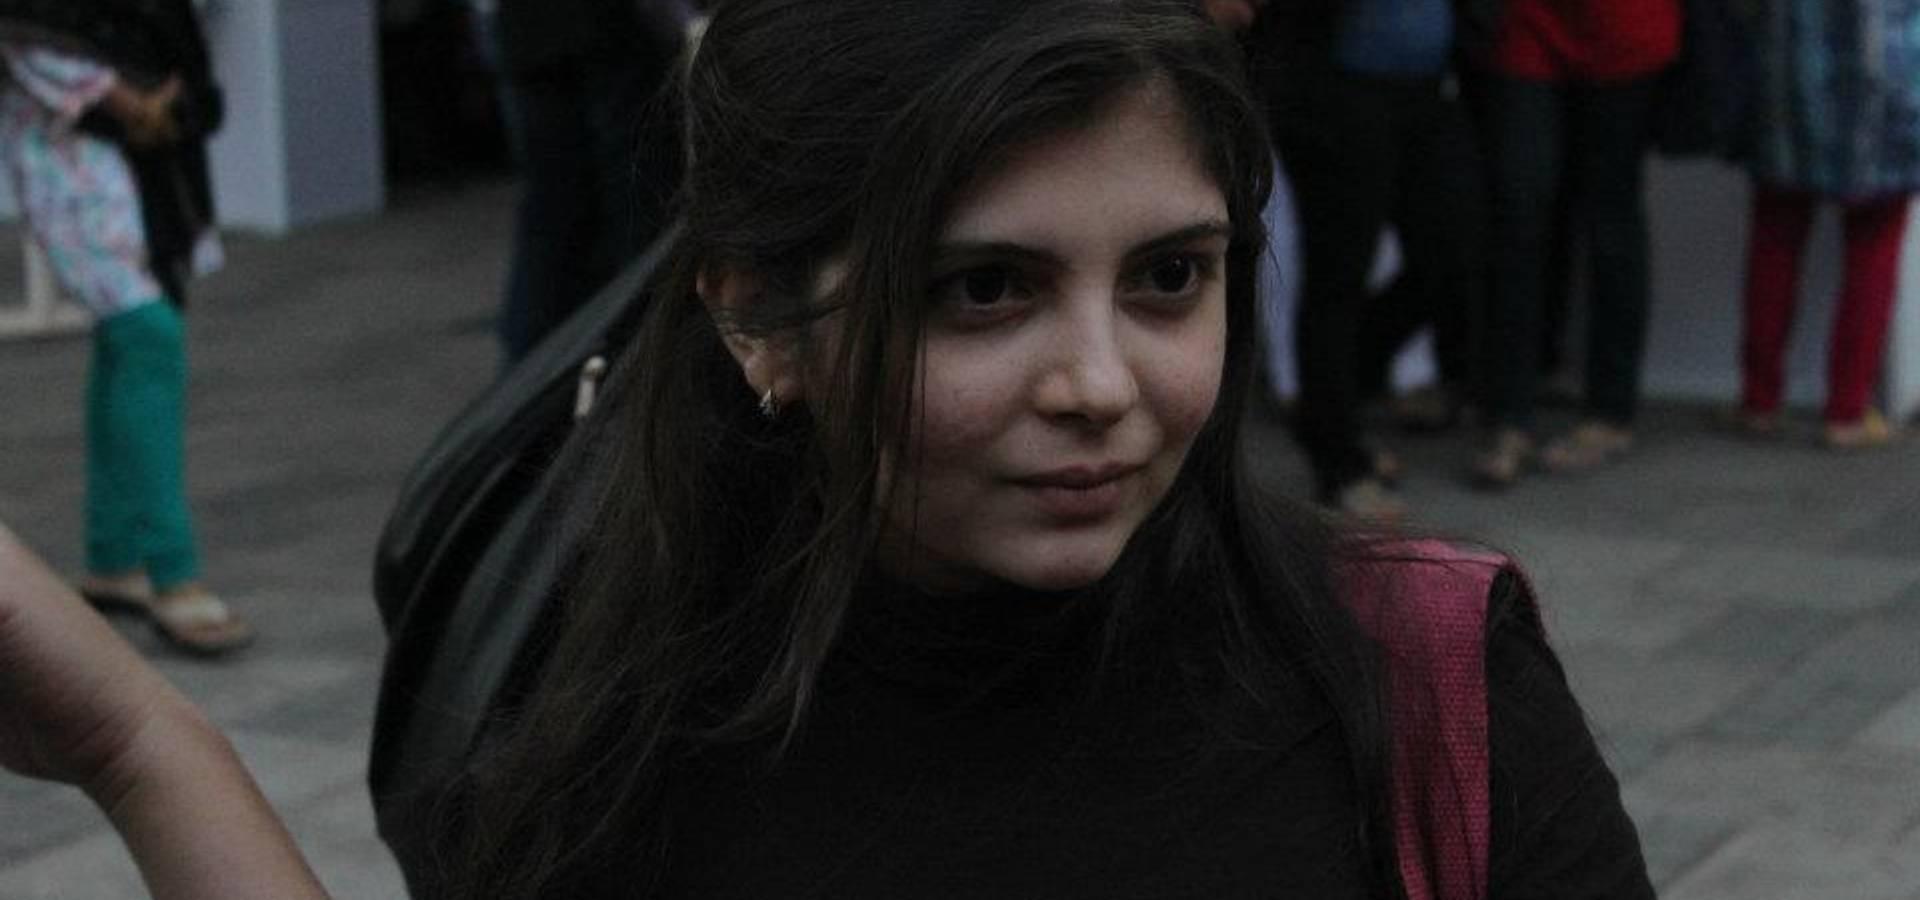 Nisha Amembal—Homify